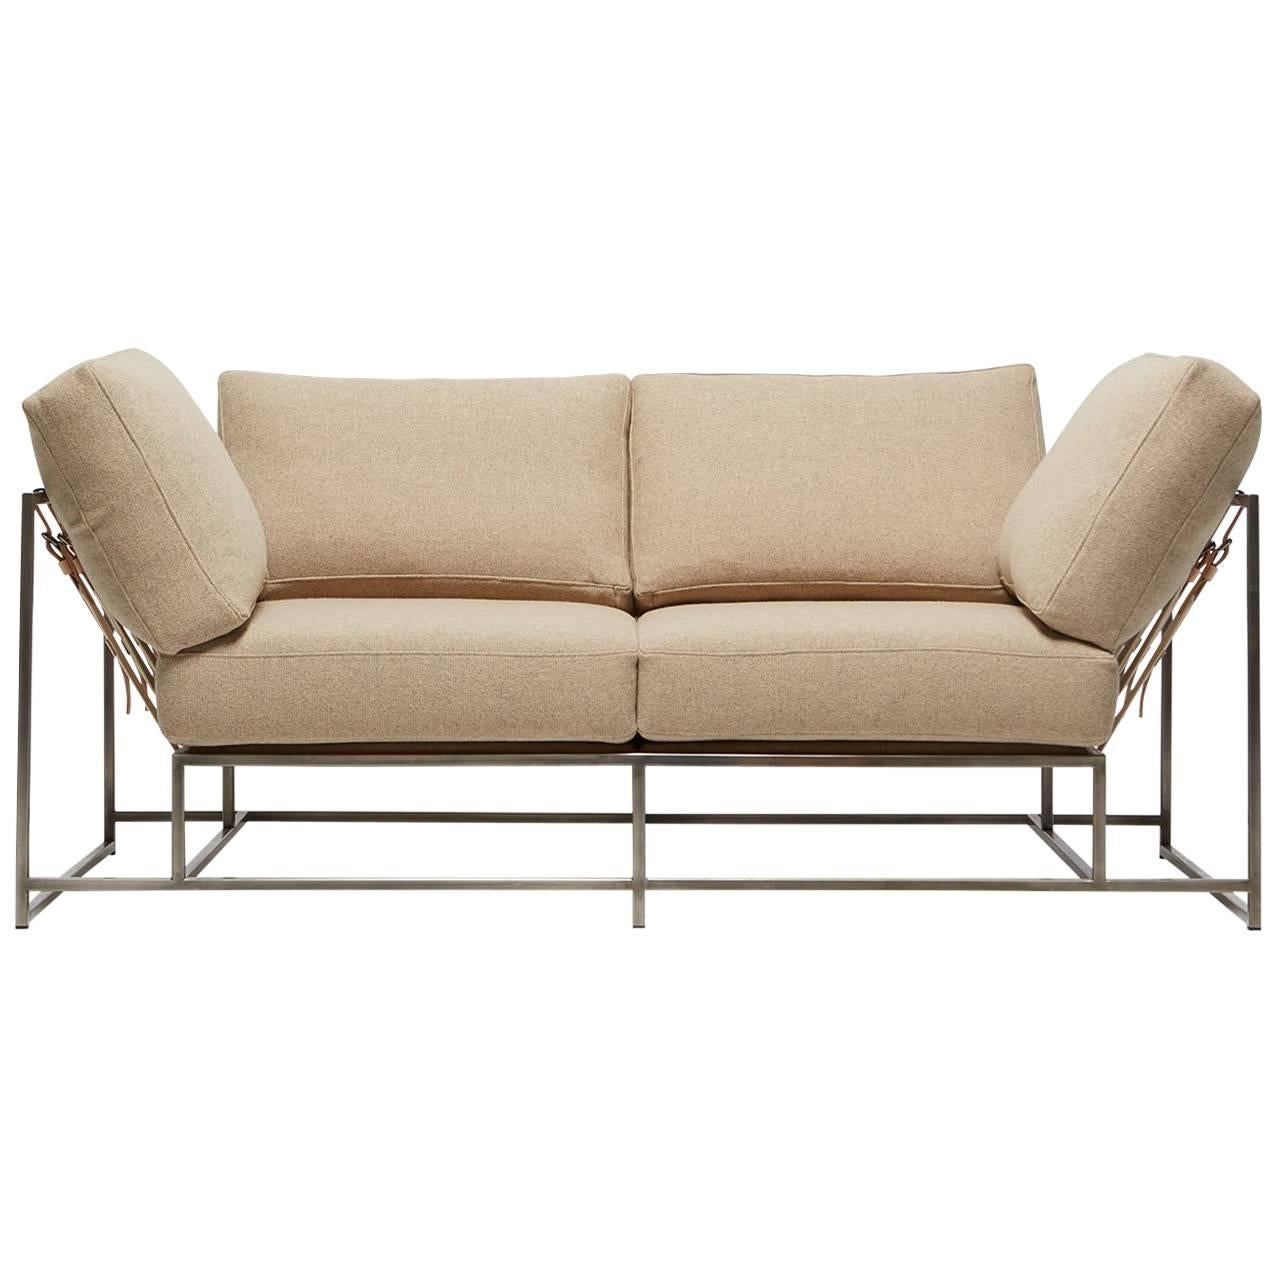 Stephen Kenn. Tan Wool And Antique Nickel Two Seat Sofa